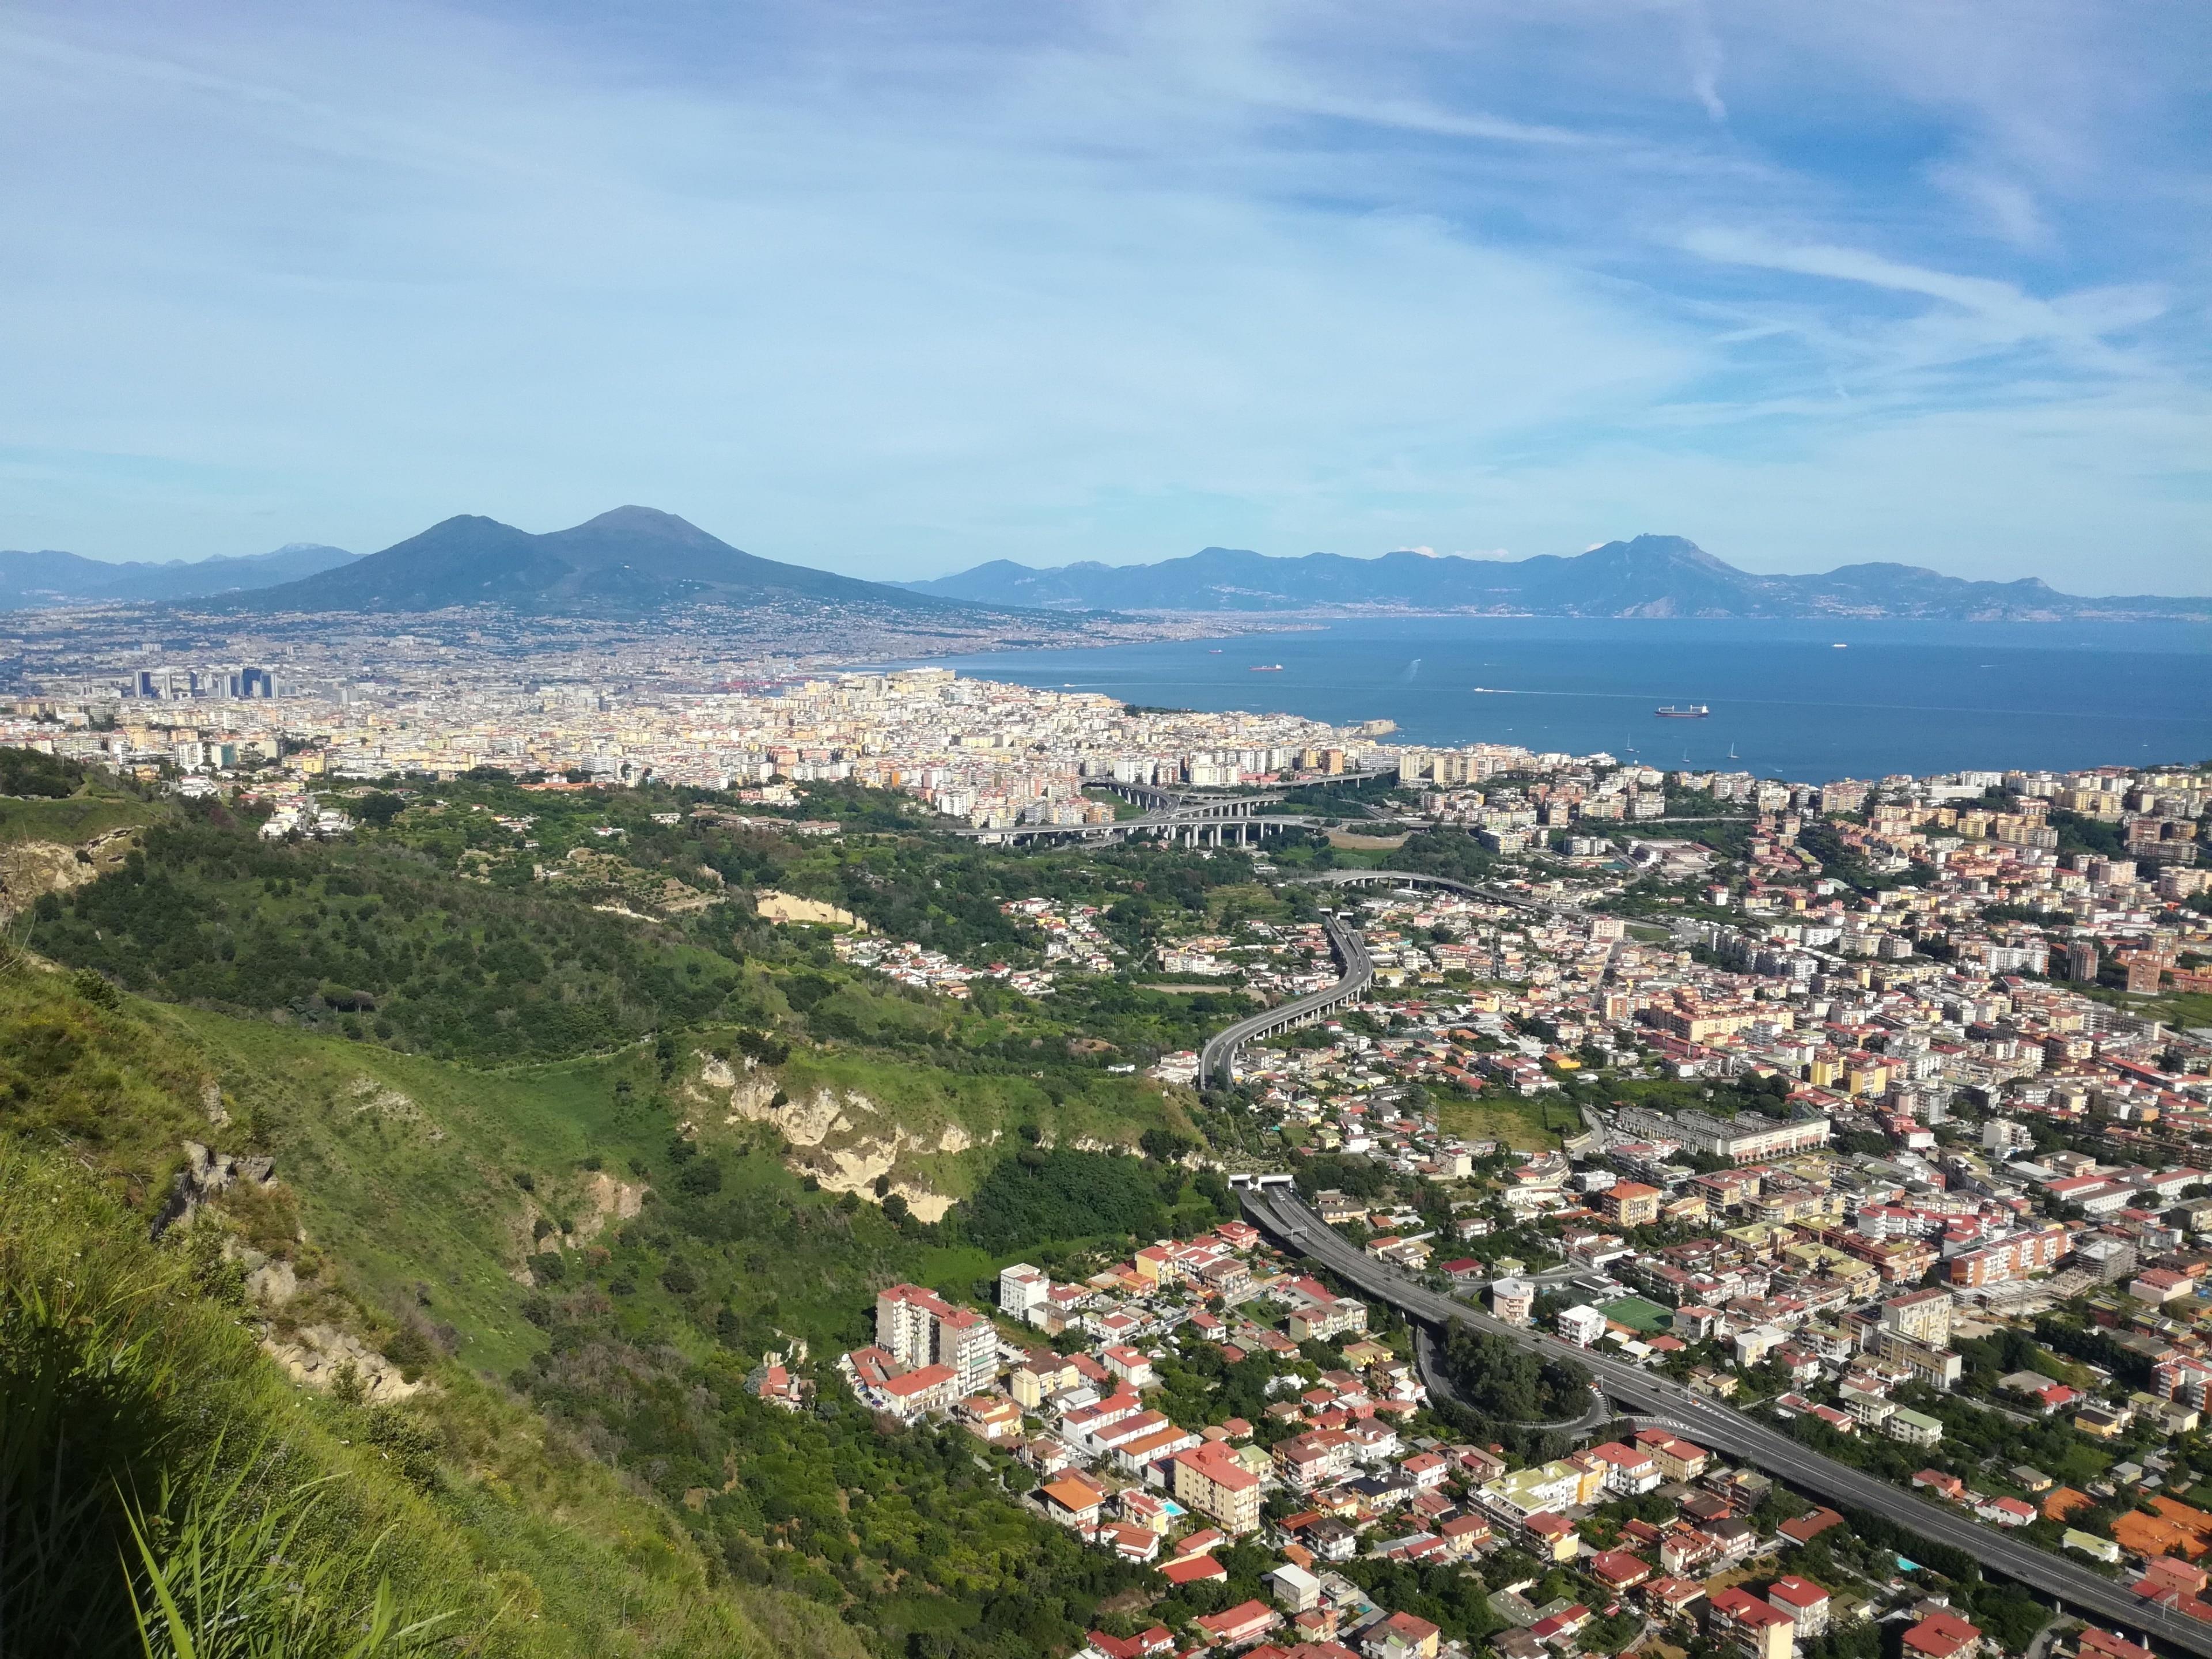 Arenella, Naples, Campania, Italy